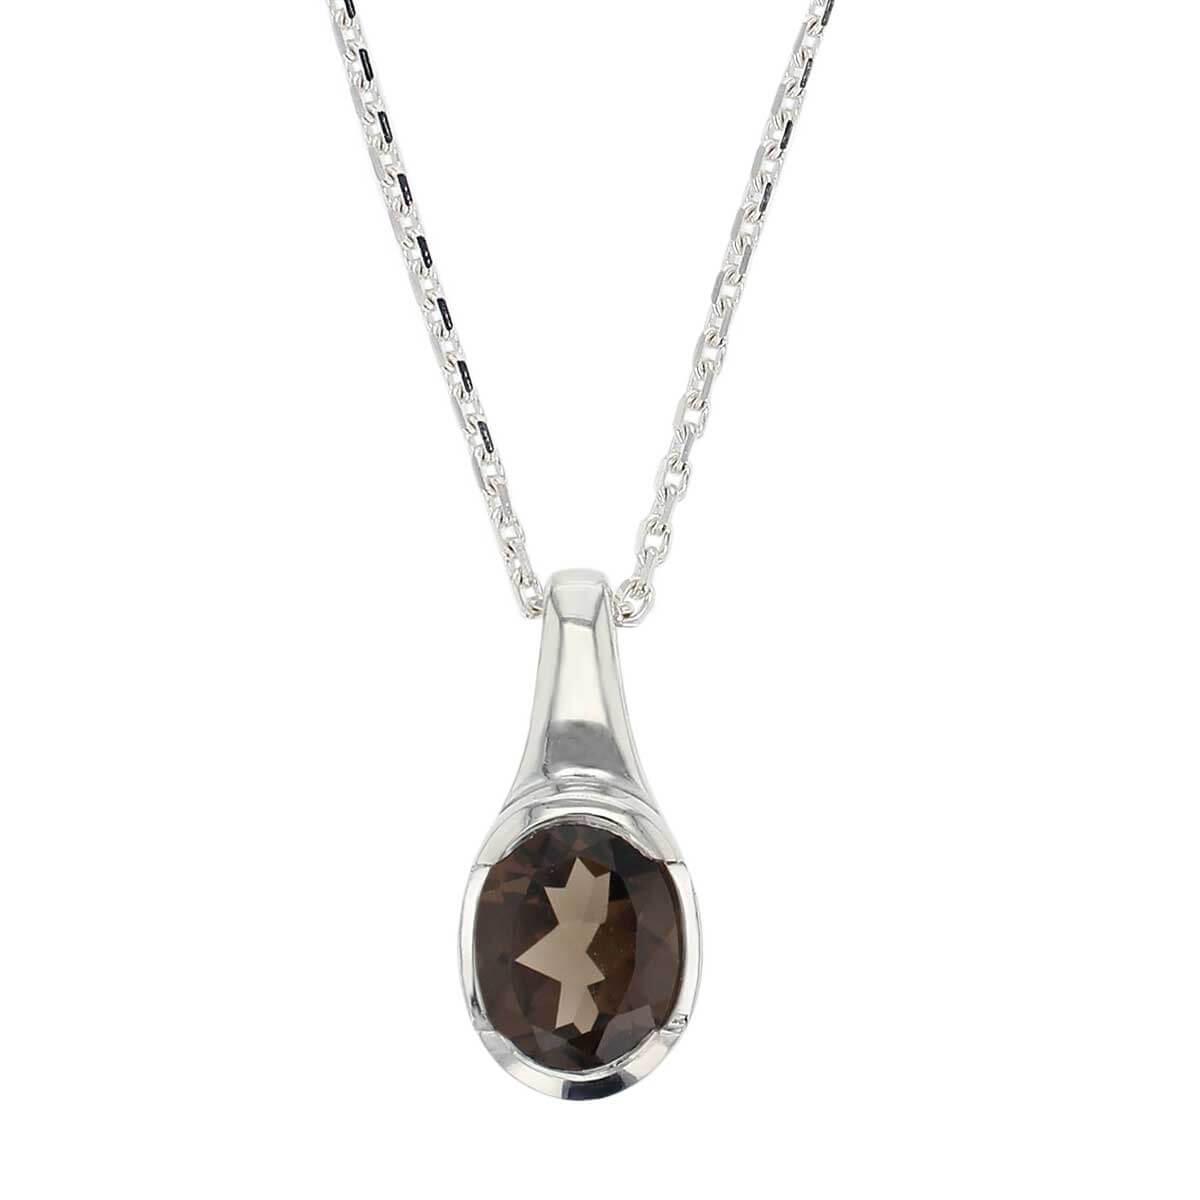 sterling silver oval cut faceted smoky quartz gemstone pendant, designer jewellery, brown quartz gem, jewelry, handmade by Faller, Londonderry, Northern Ireland, Irish hand crafted, darcy, D'arcy, smokey